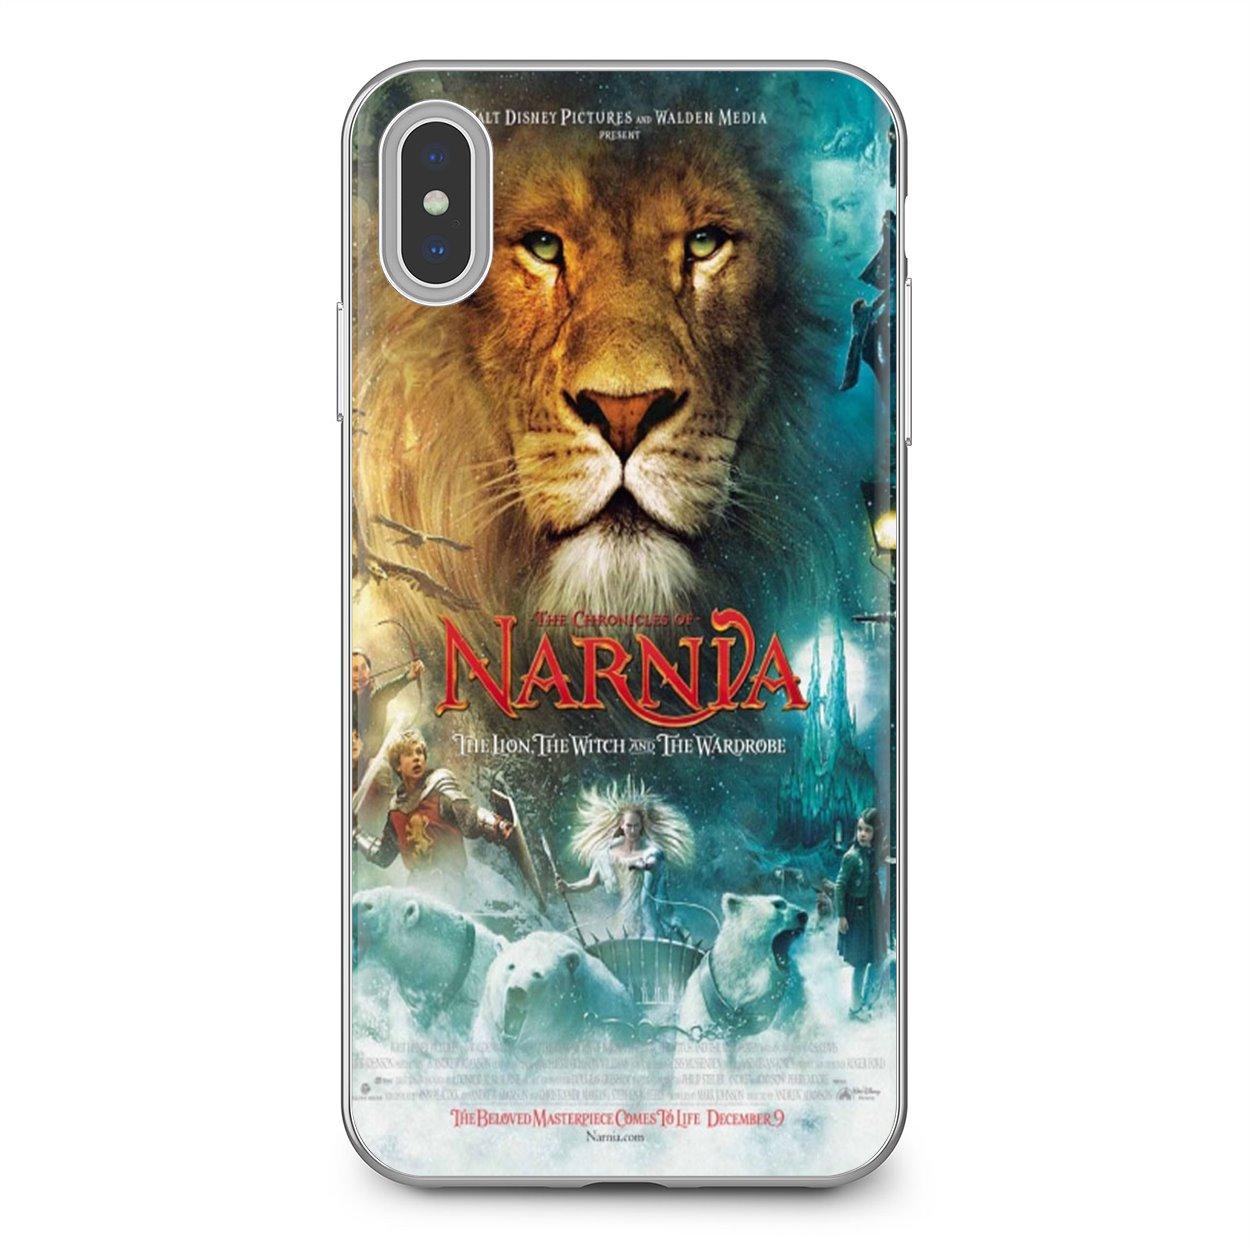 Las crónicas de Narnia Aslan León para HTC uno X9 M7 M8 A9 M9 M10 E9 más deseo 630, 530, 626, 628, 816, 820, 830, fundas de TPU blandas